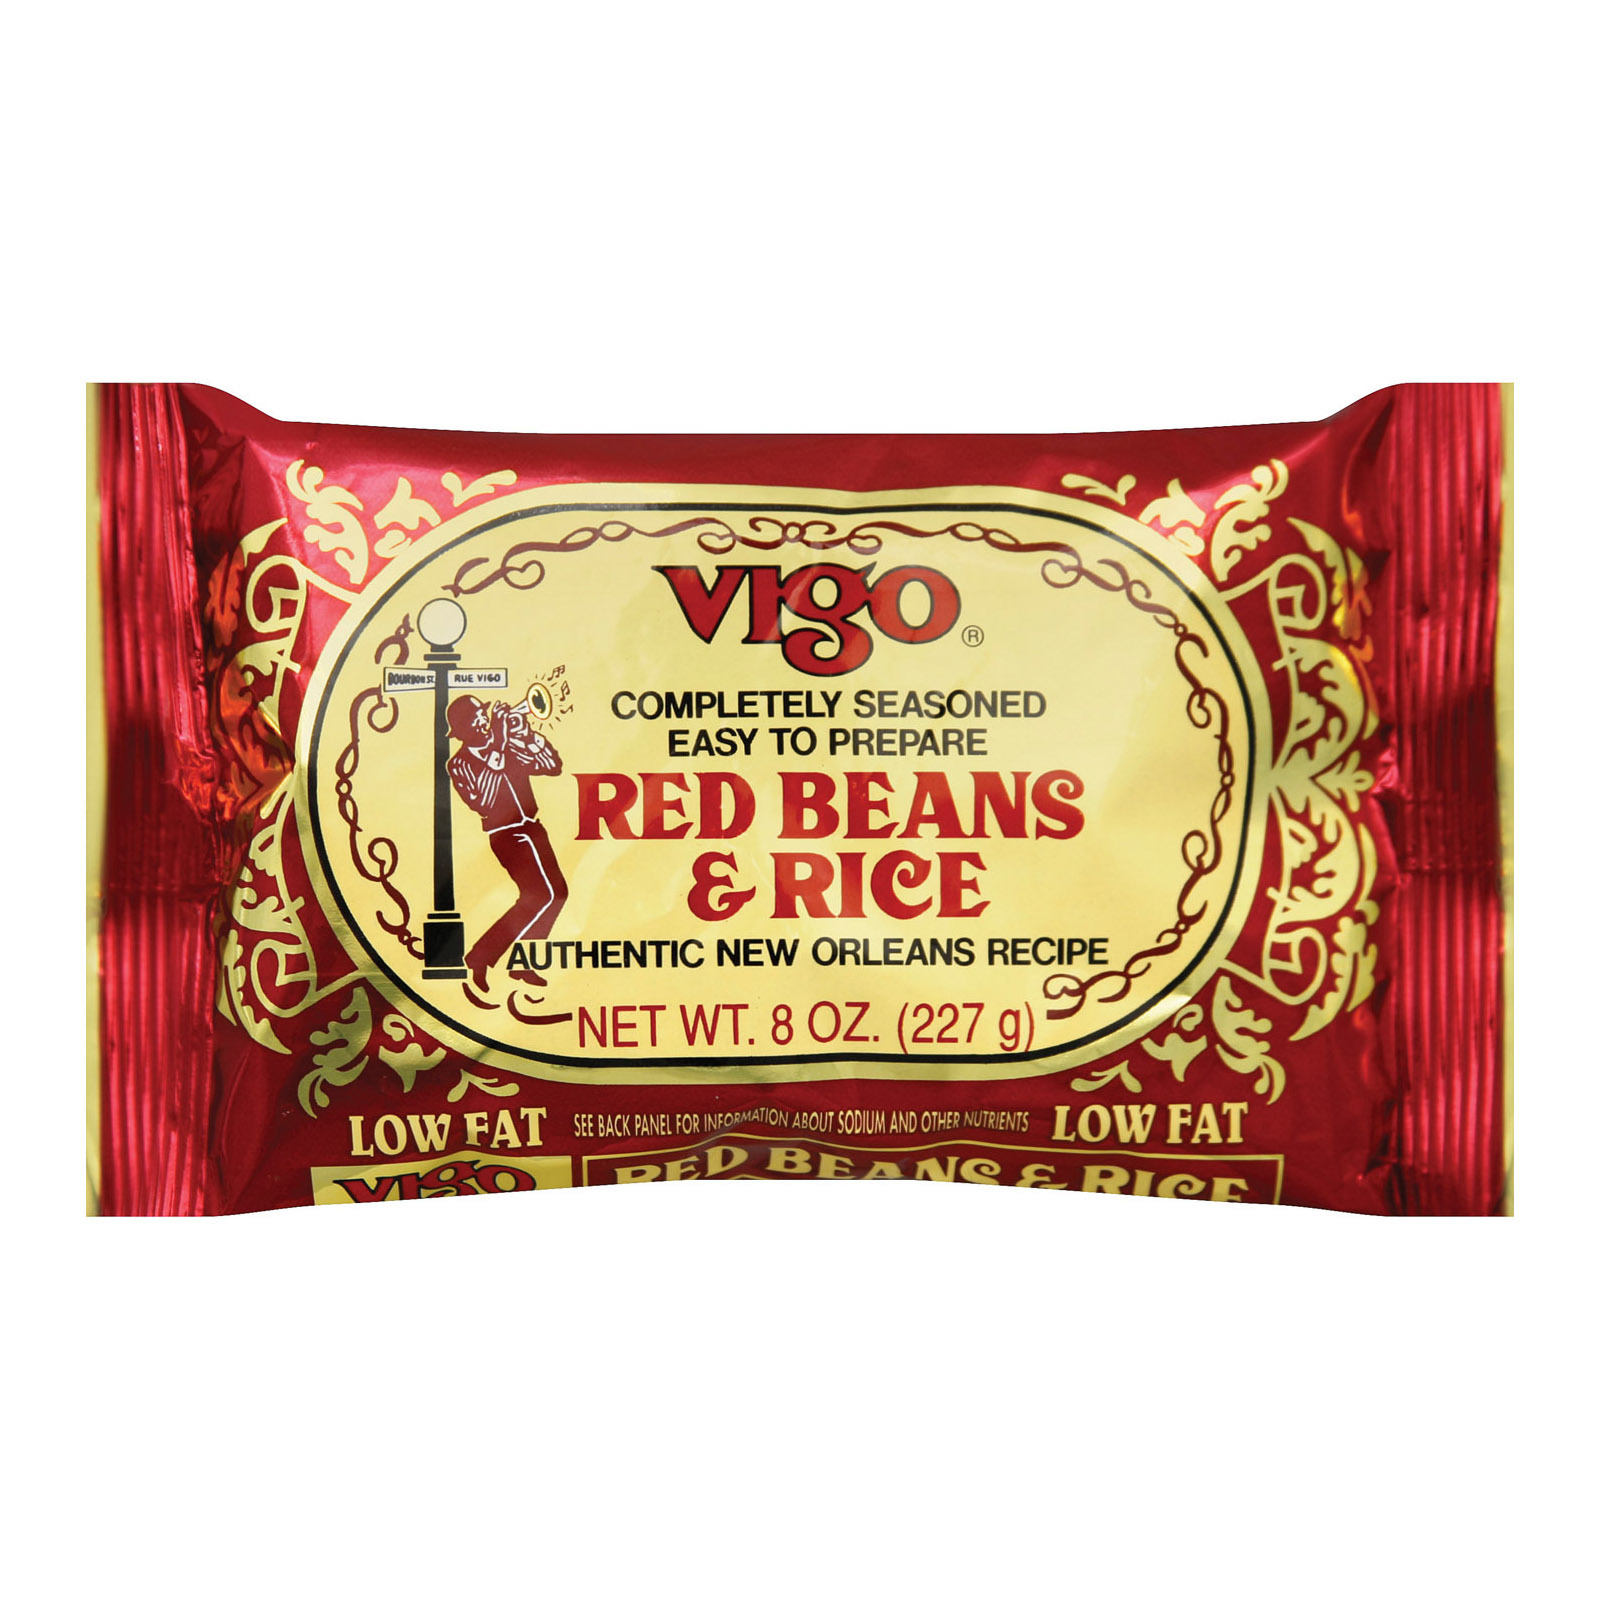 Vigo Red Beans and Rice - Case of 12 - 8 oz.